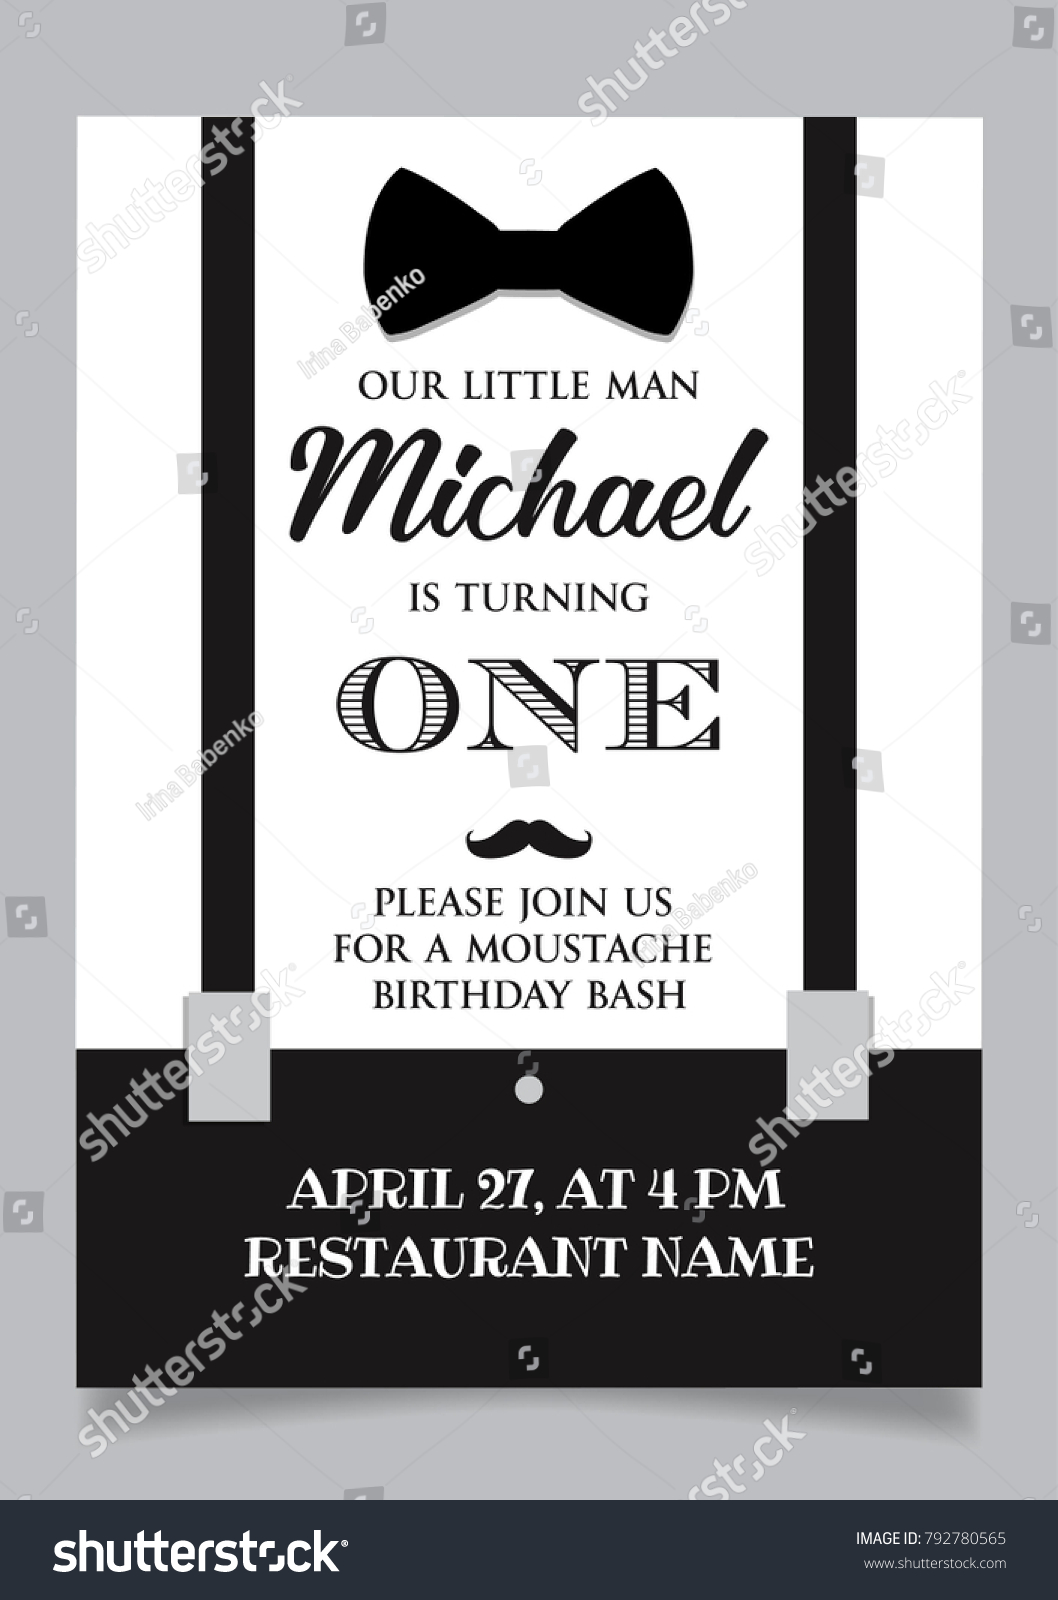 Funny vintage baby birthday mustache bash invitation   EZ Canvas